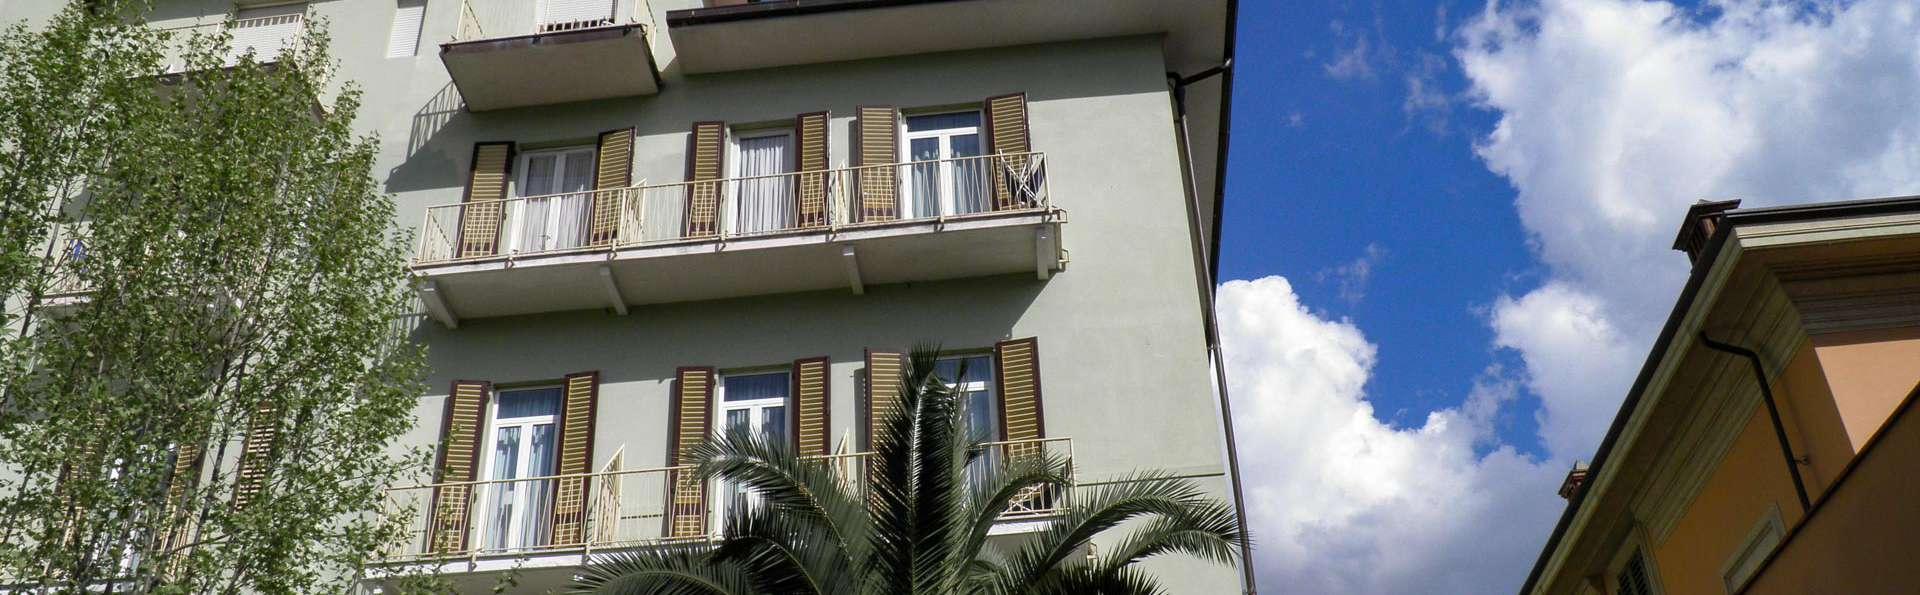 HG Hotel Cappelli - EDIT_FRONT_02.jpg